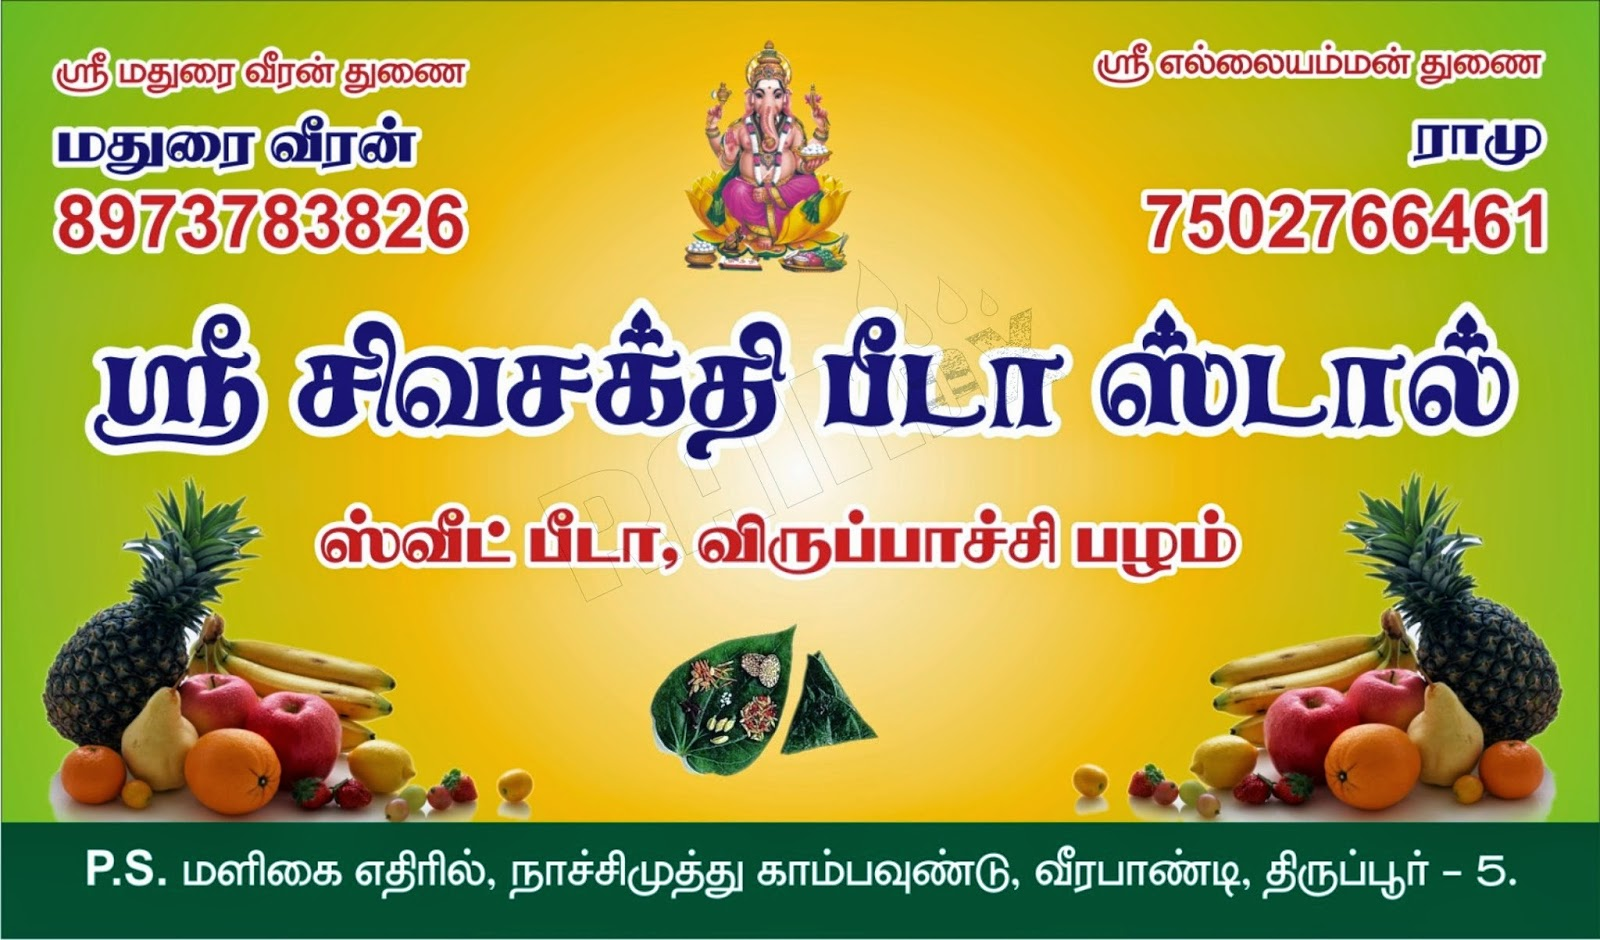 visiting card design sri sivasakthi beeda stall